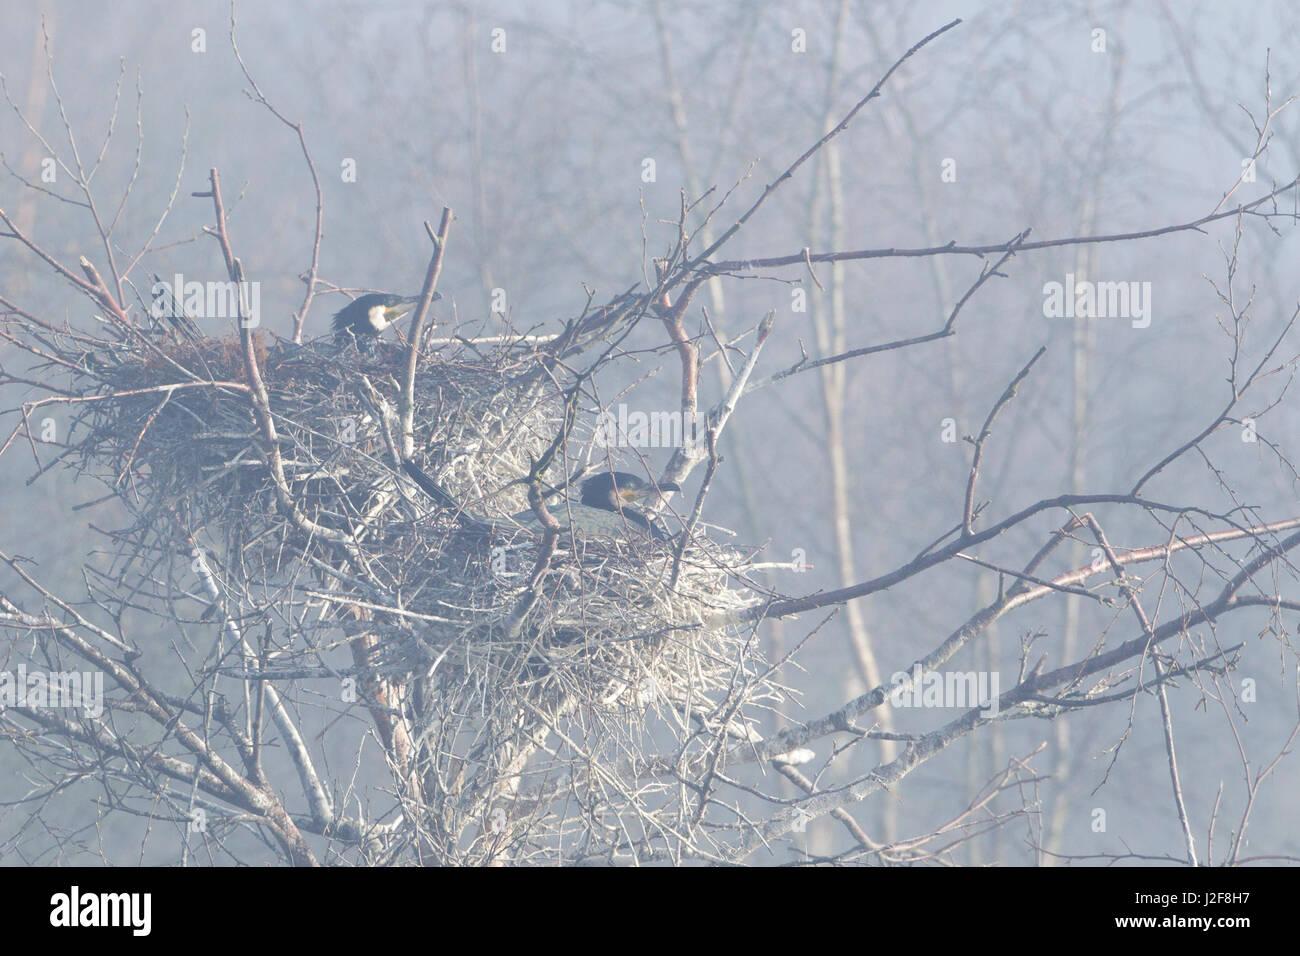 breeding colony of great cormorants on a foggy morning - Stock Image